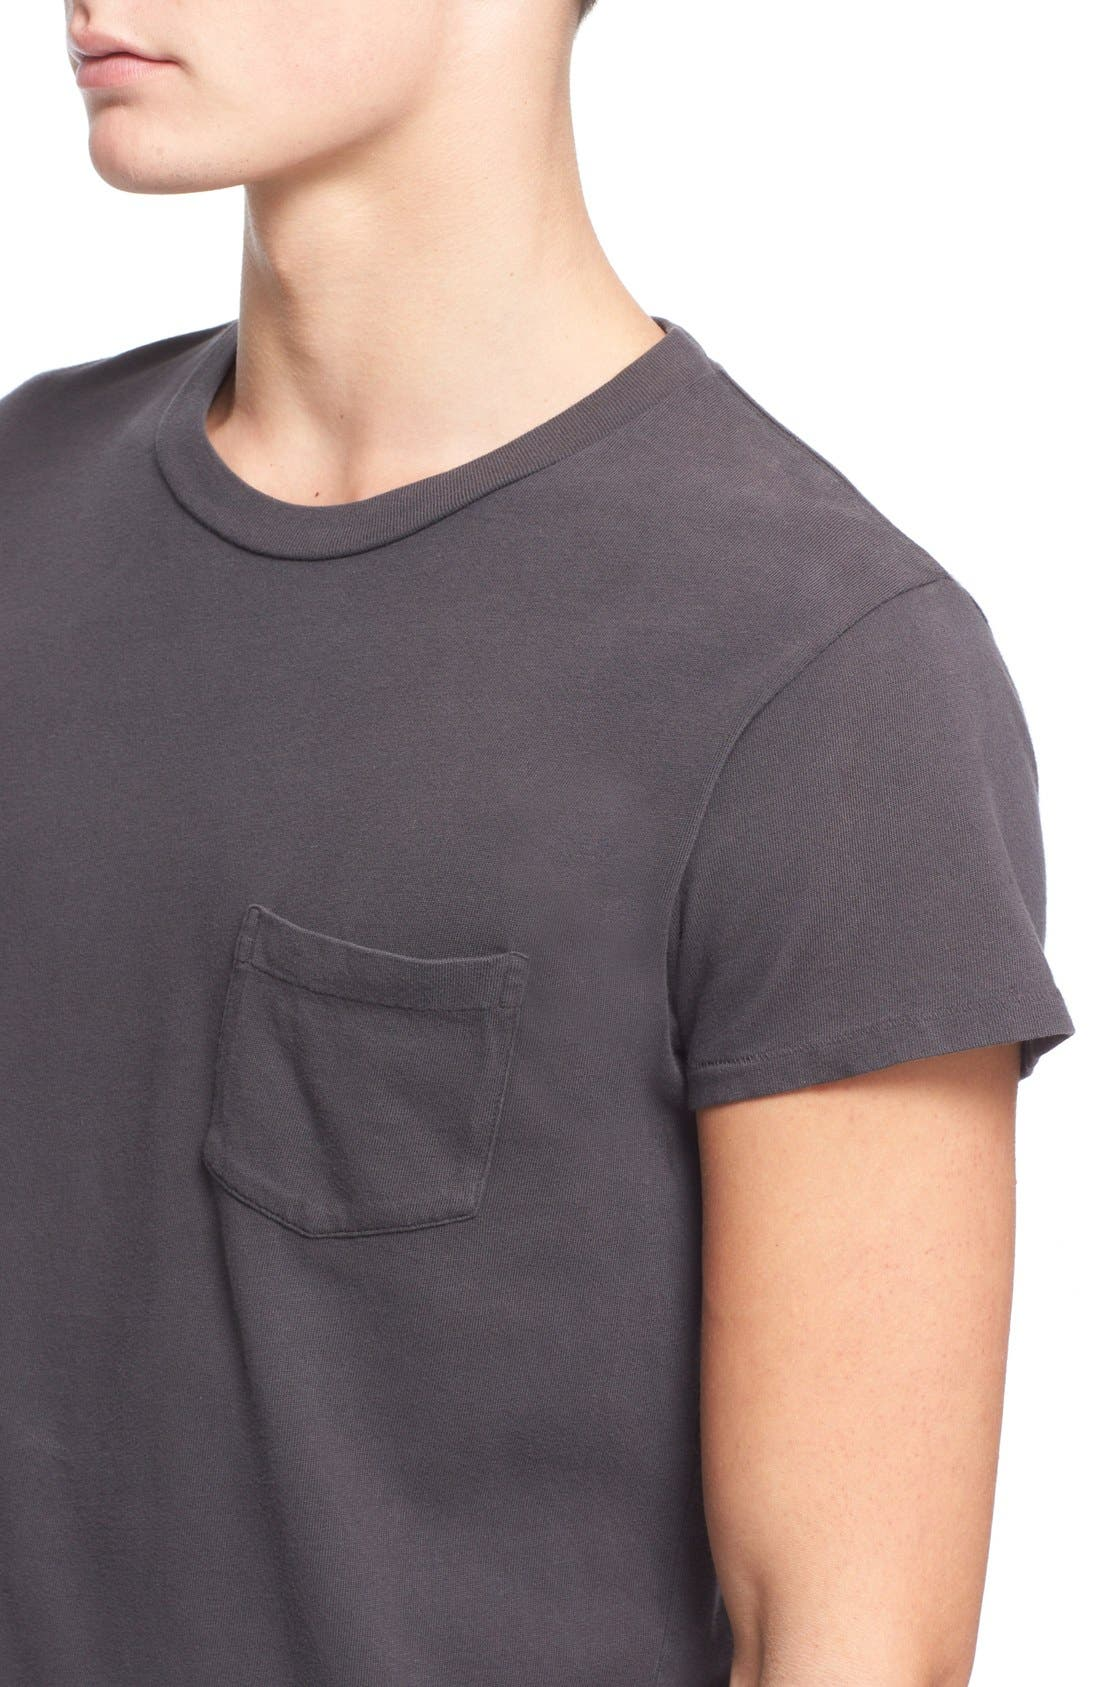 Levi's Vintage Clothing '1950s' Pocket T-Shirt,                             Alternate thumbnail 4, color,                             001